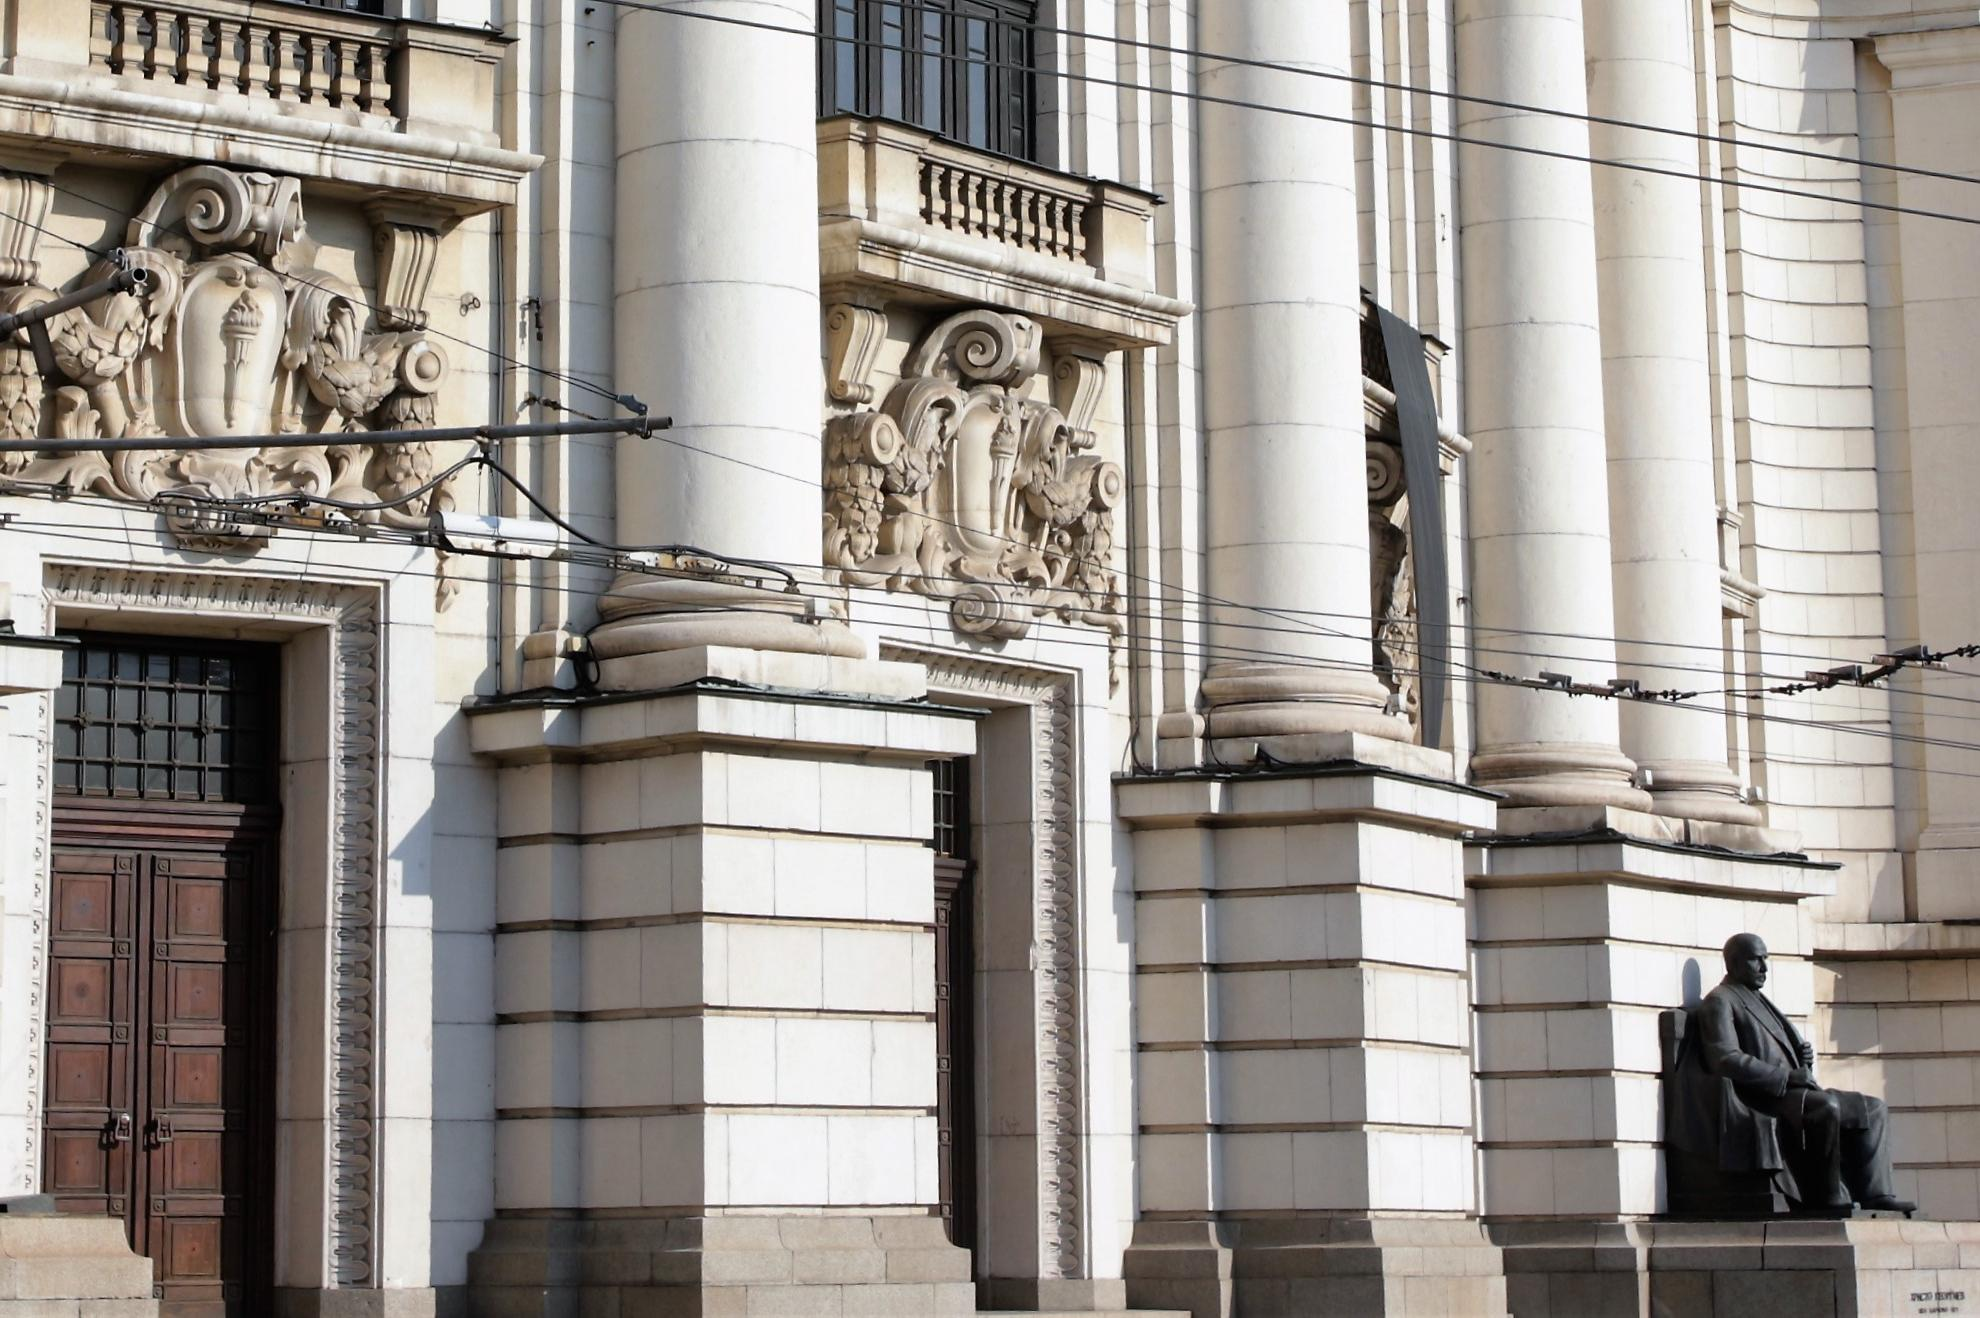 Софийският университет: Махат се стари климатици, няма нови дупки